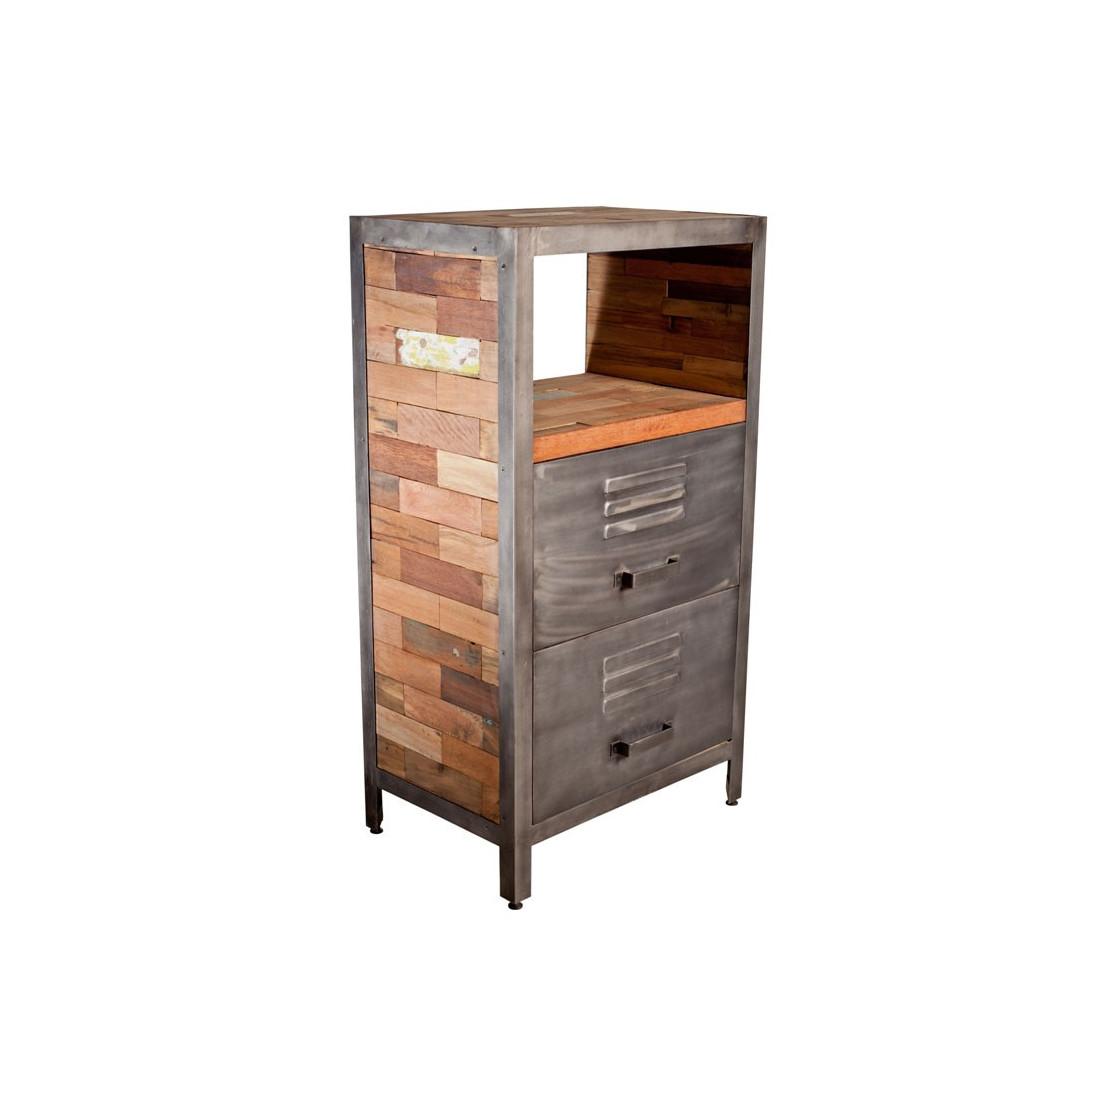 Meuble d 39 appoint 2 tiroirs 1 niche bois fabrik univers for Meuble a petits tiroirs